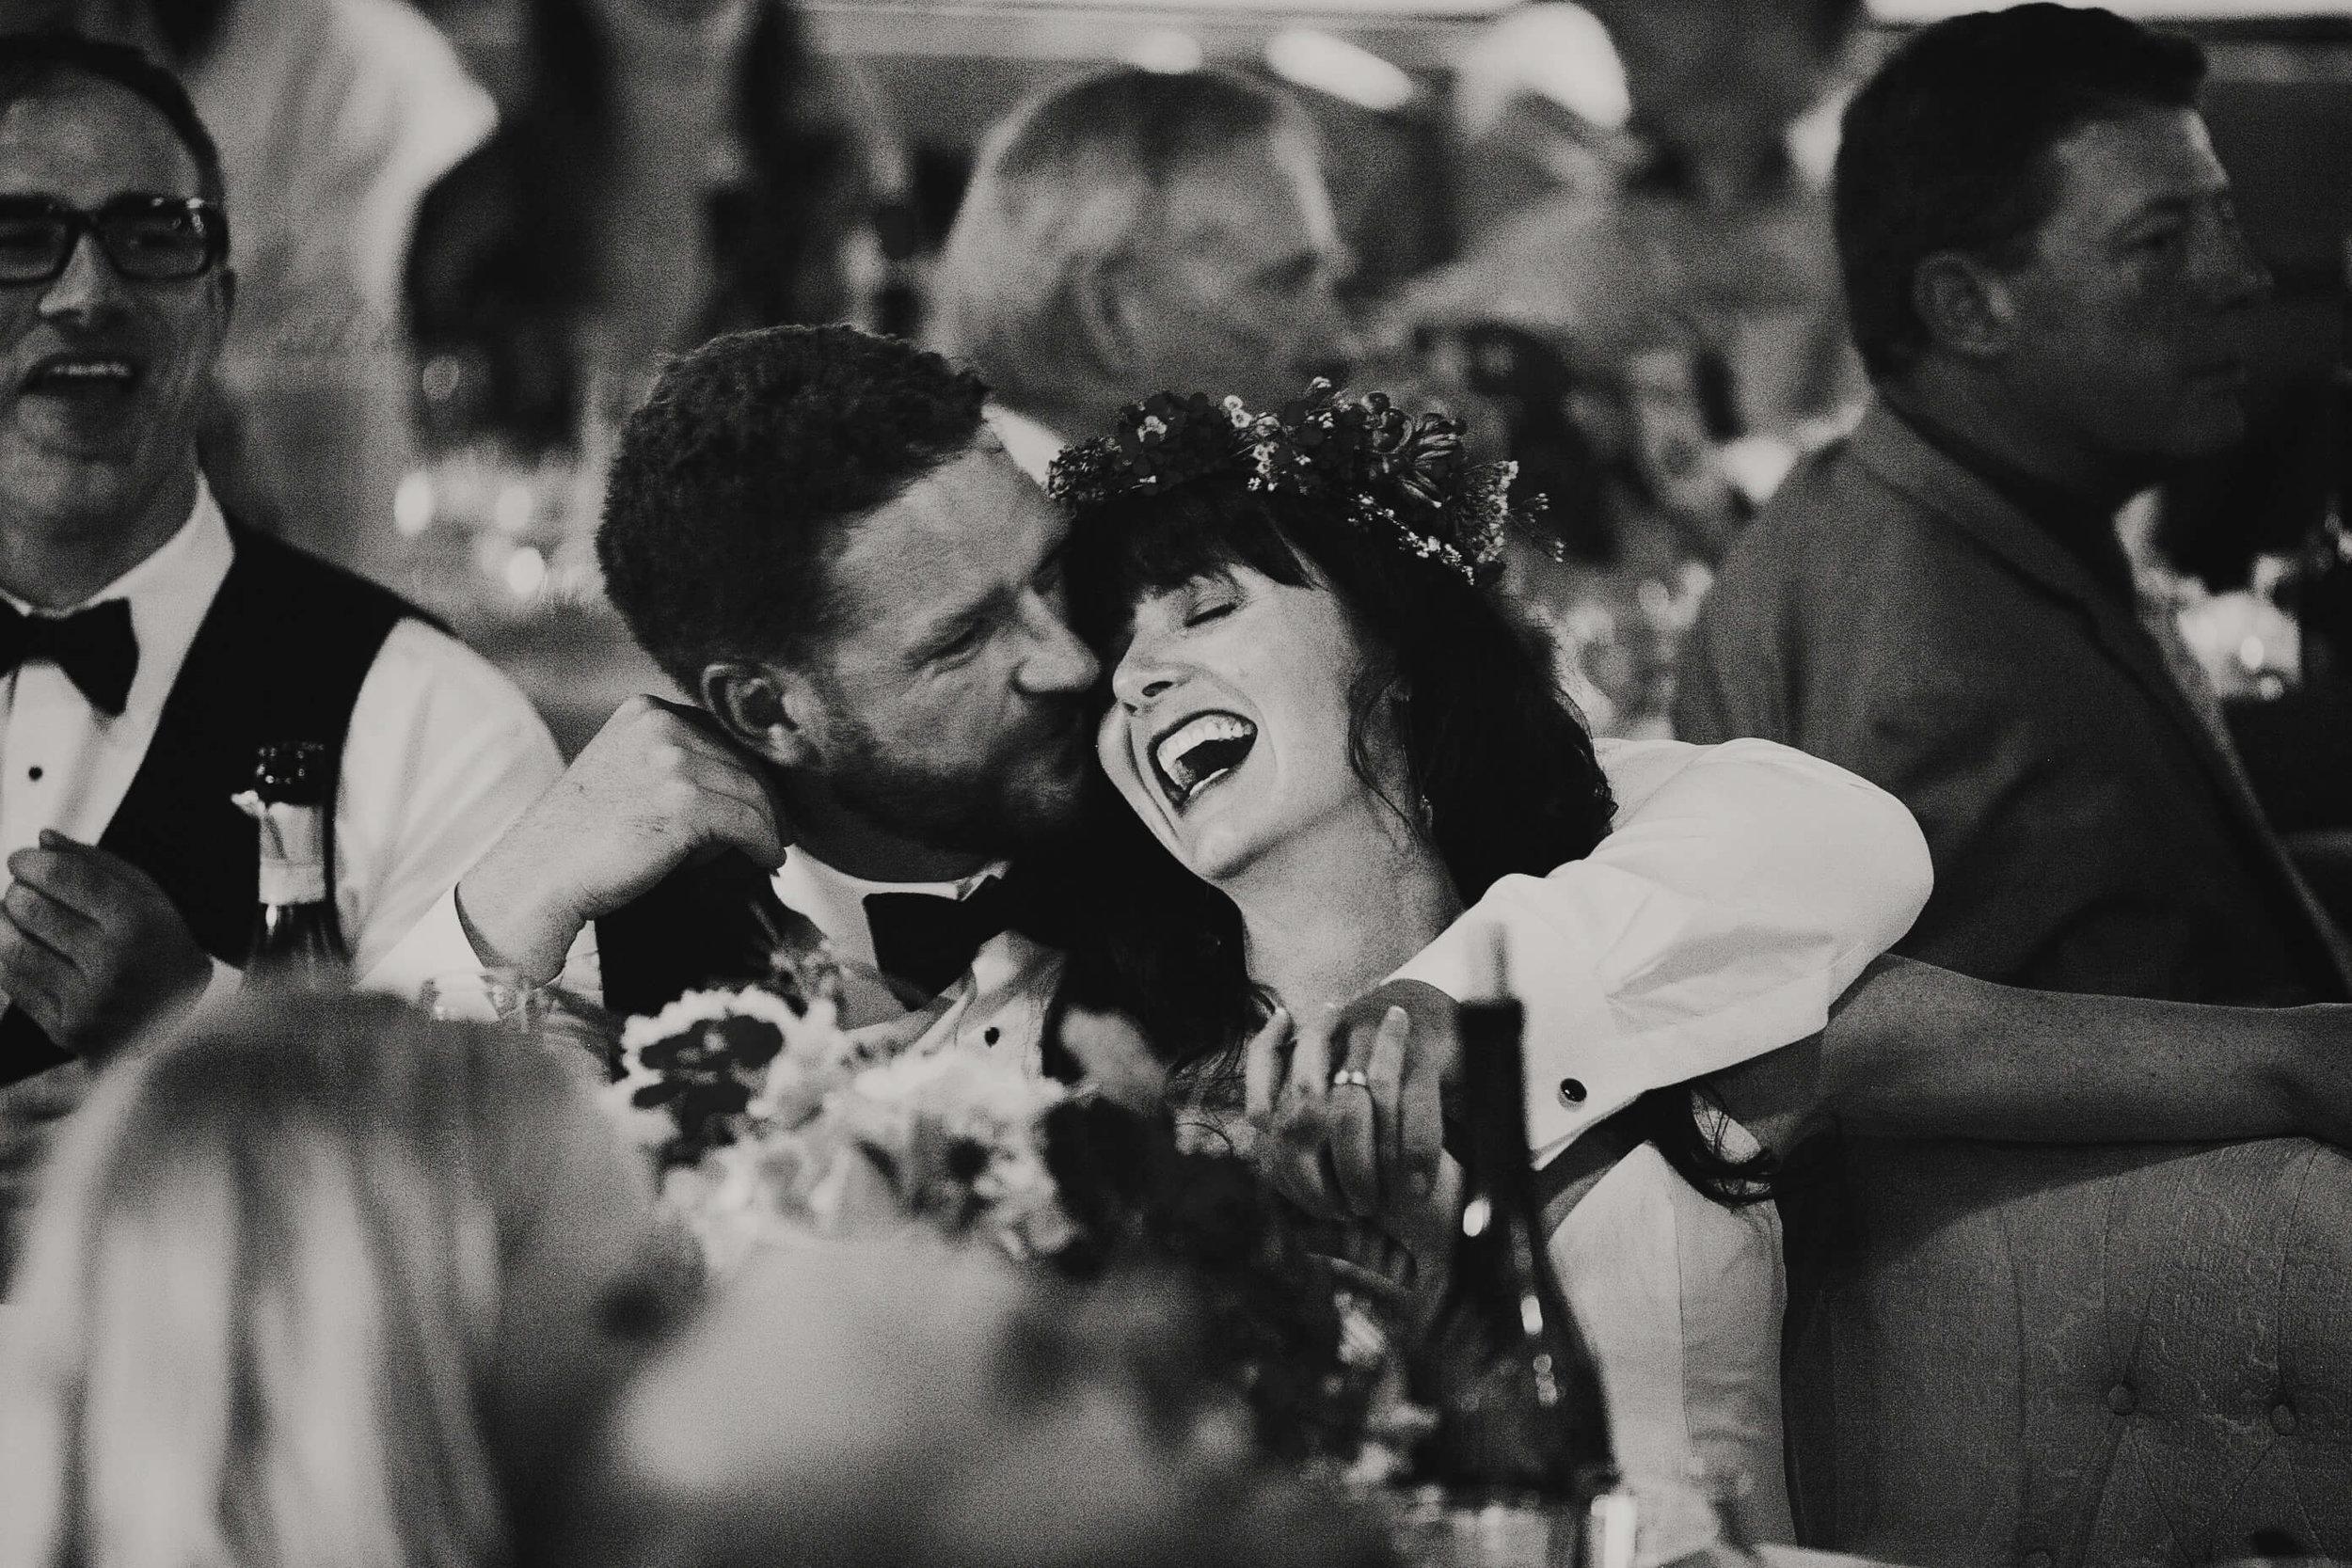 engle-olson-fran-ze-photo-montana-wedding-131.jpg